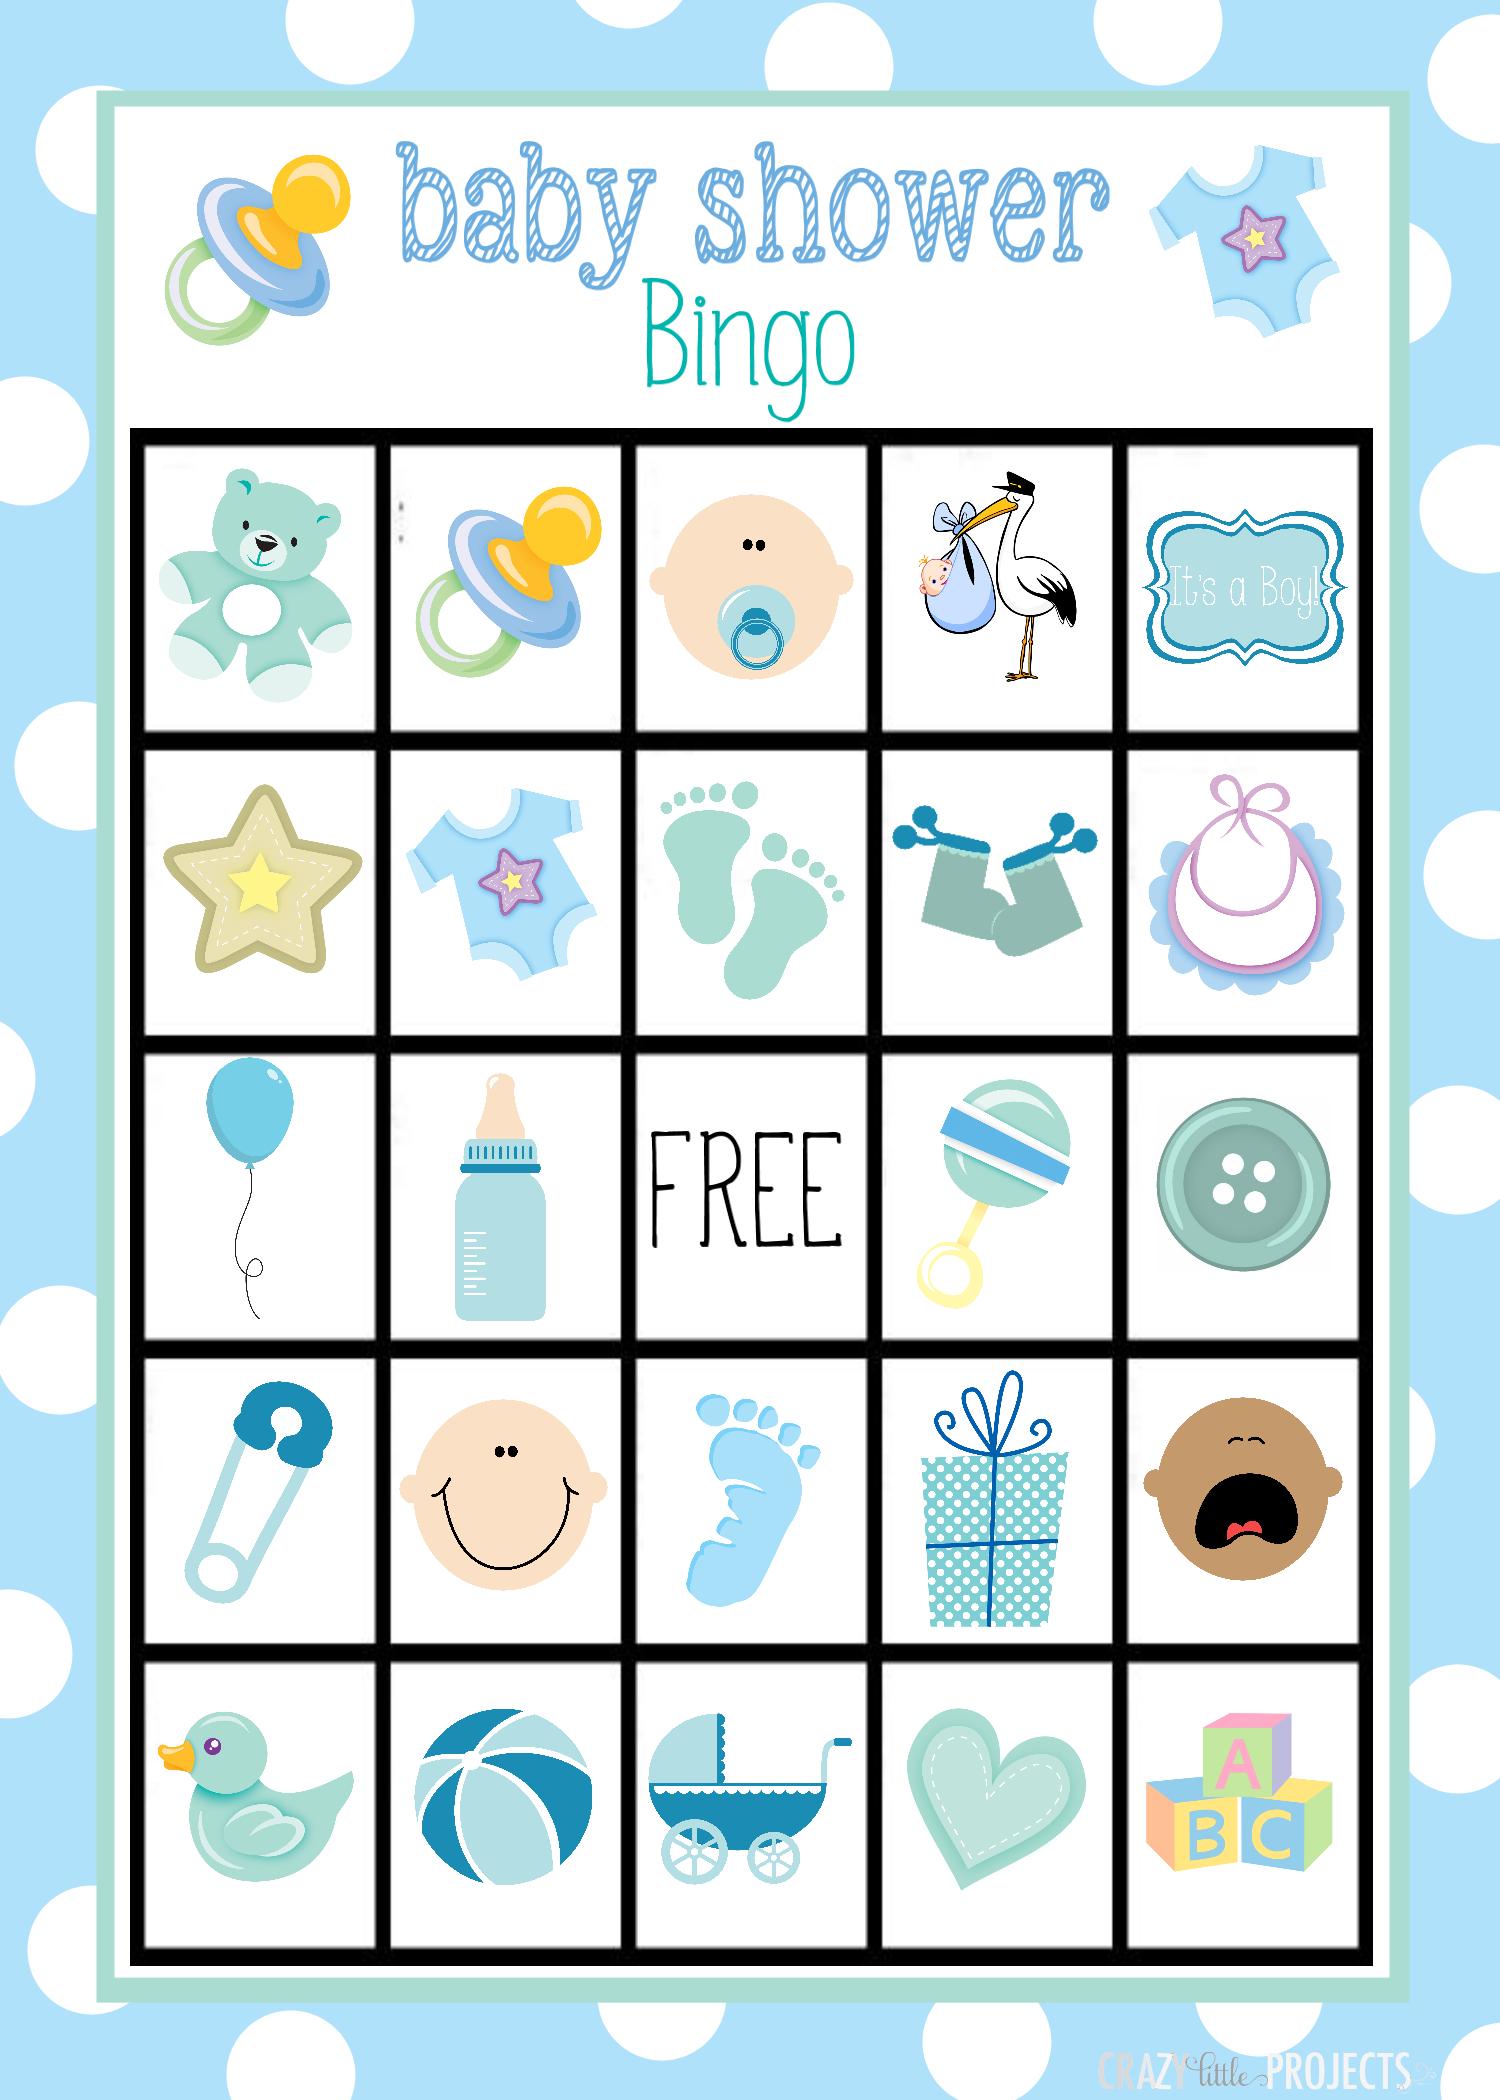 Baby Shower Bingo Cards - Free Printable Baby Shower Bingo Cards